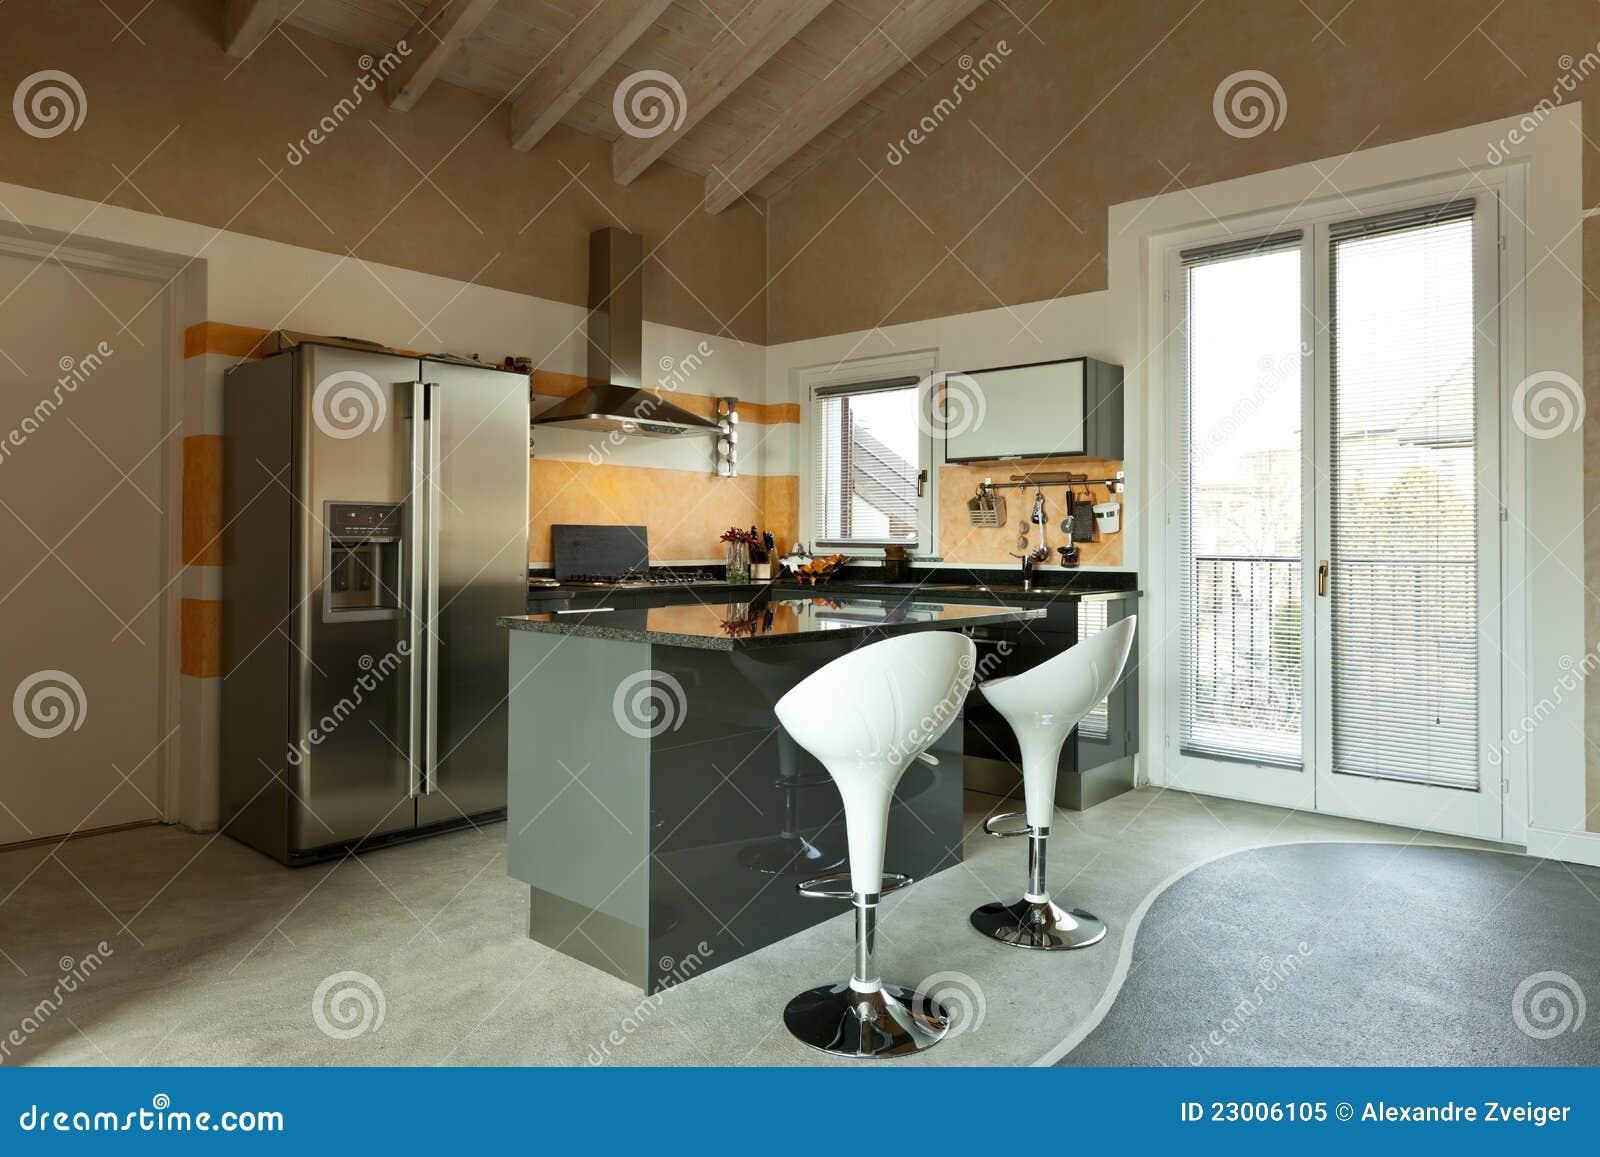 Altezza bancone cucina sgabelli ak regardsdefemmes sgabelli